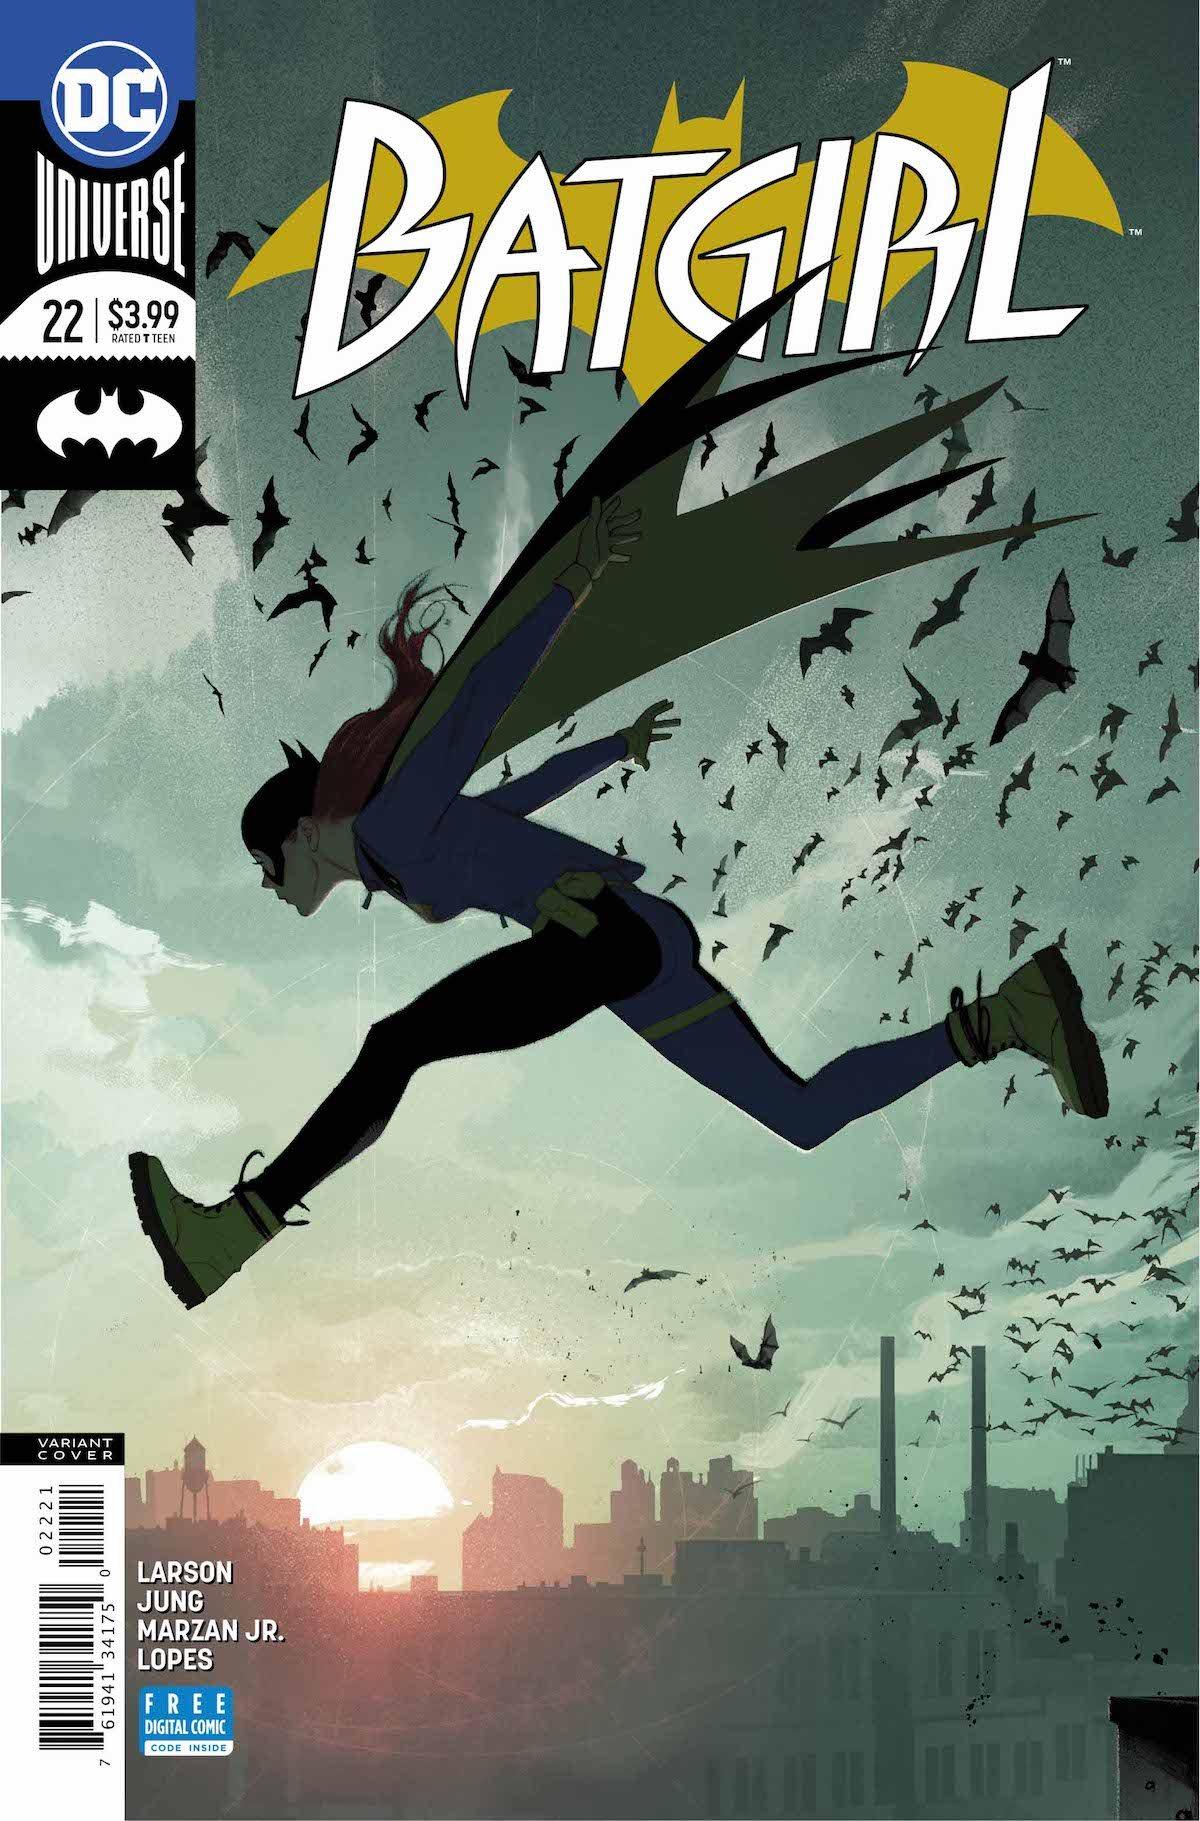 Batgirl #22 variant cover